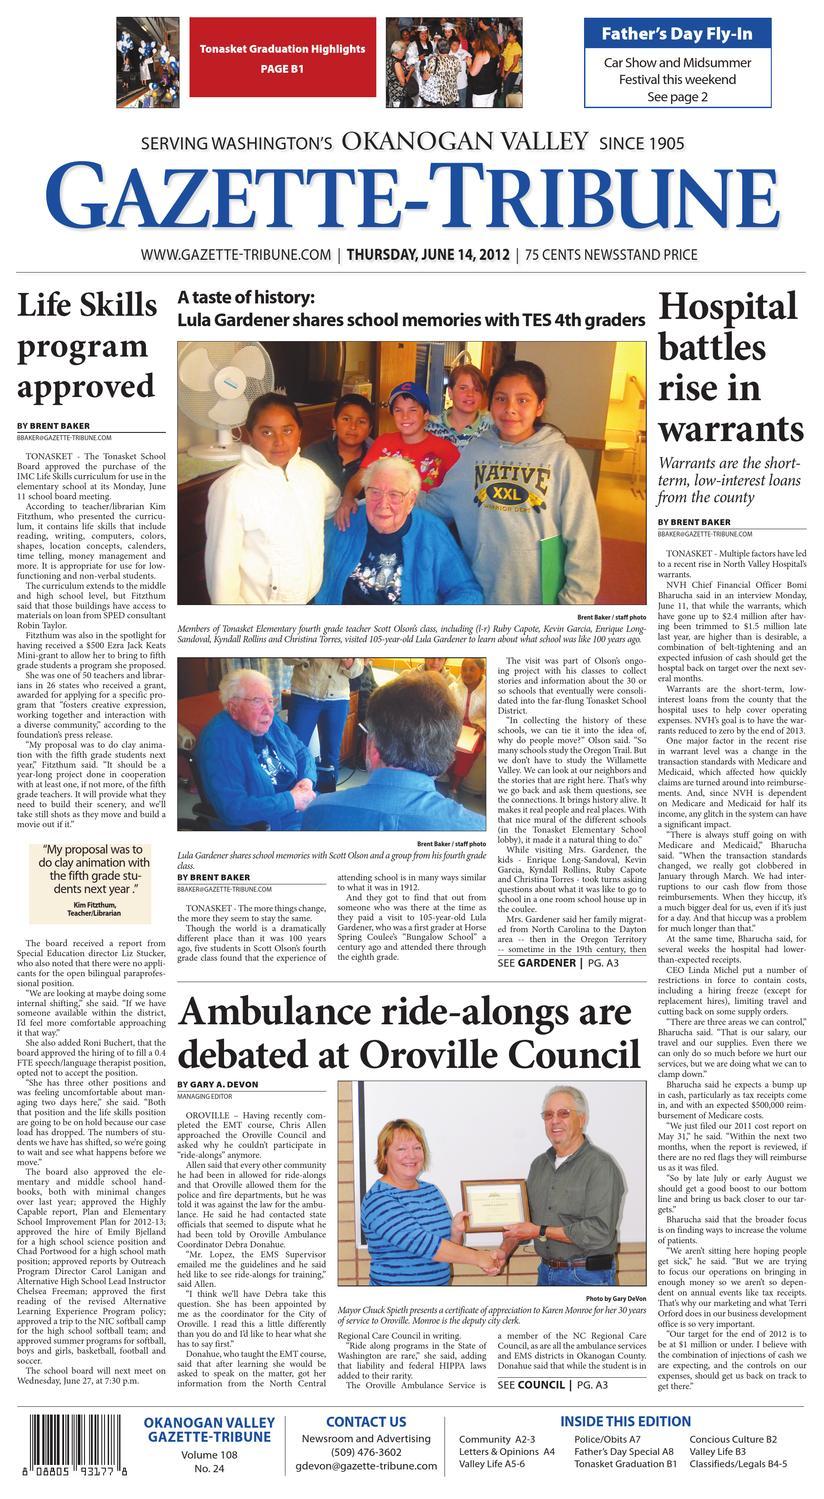 Okanogan Valley Gazette Tribune June 14 2012 By Sound Publishing